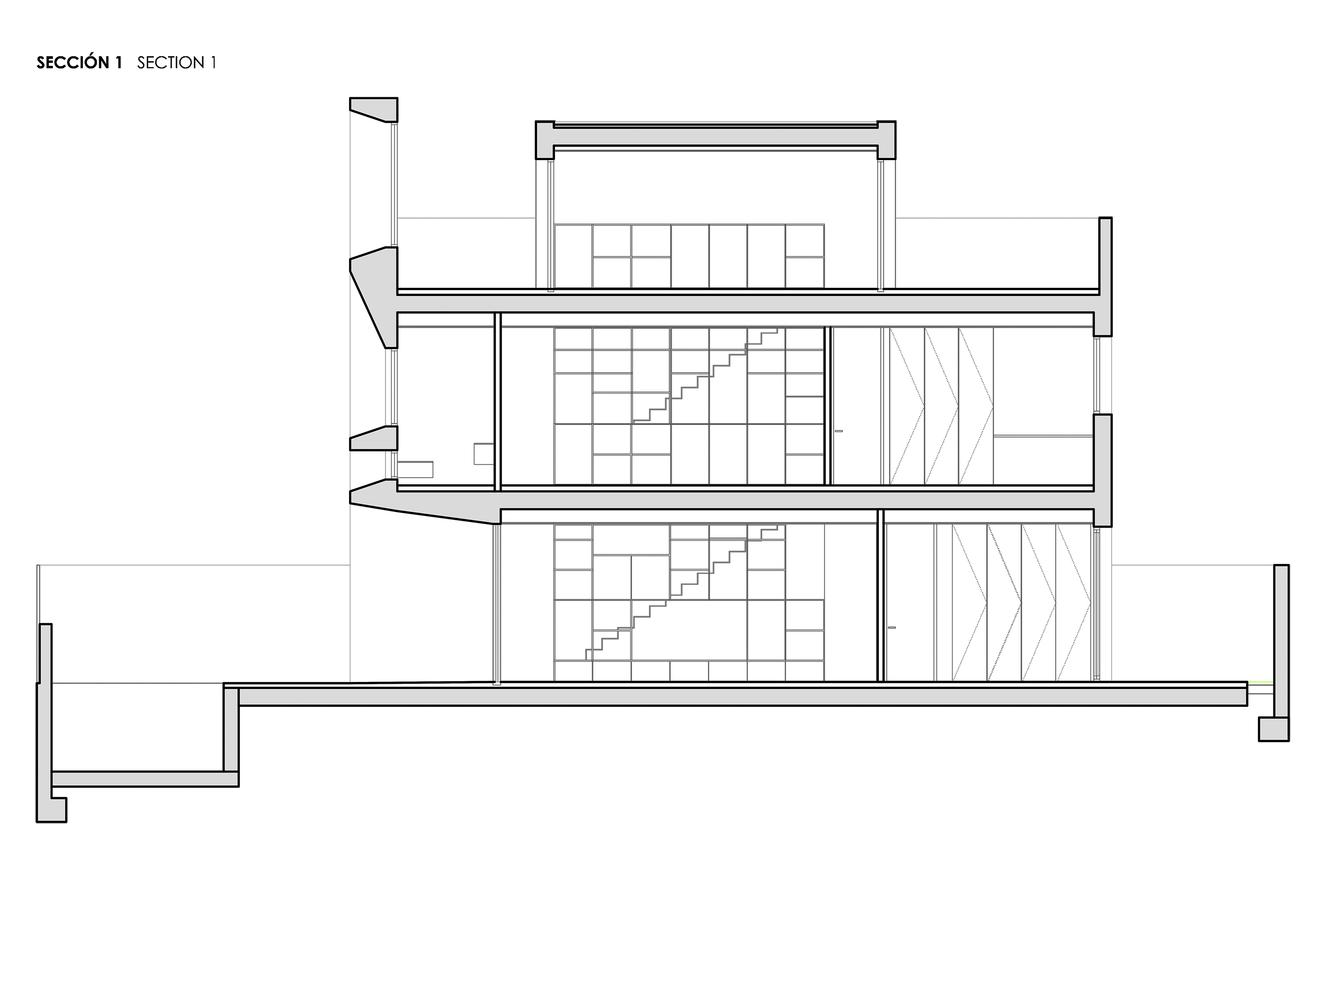 Mặt bằng biệt thự 300m2 - Brise Soleil House 2